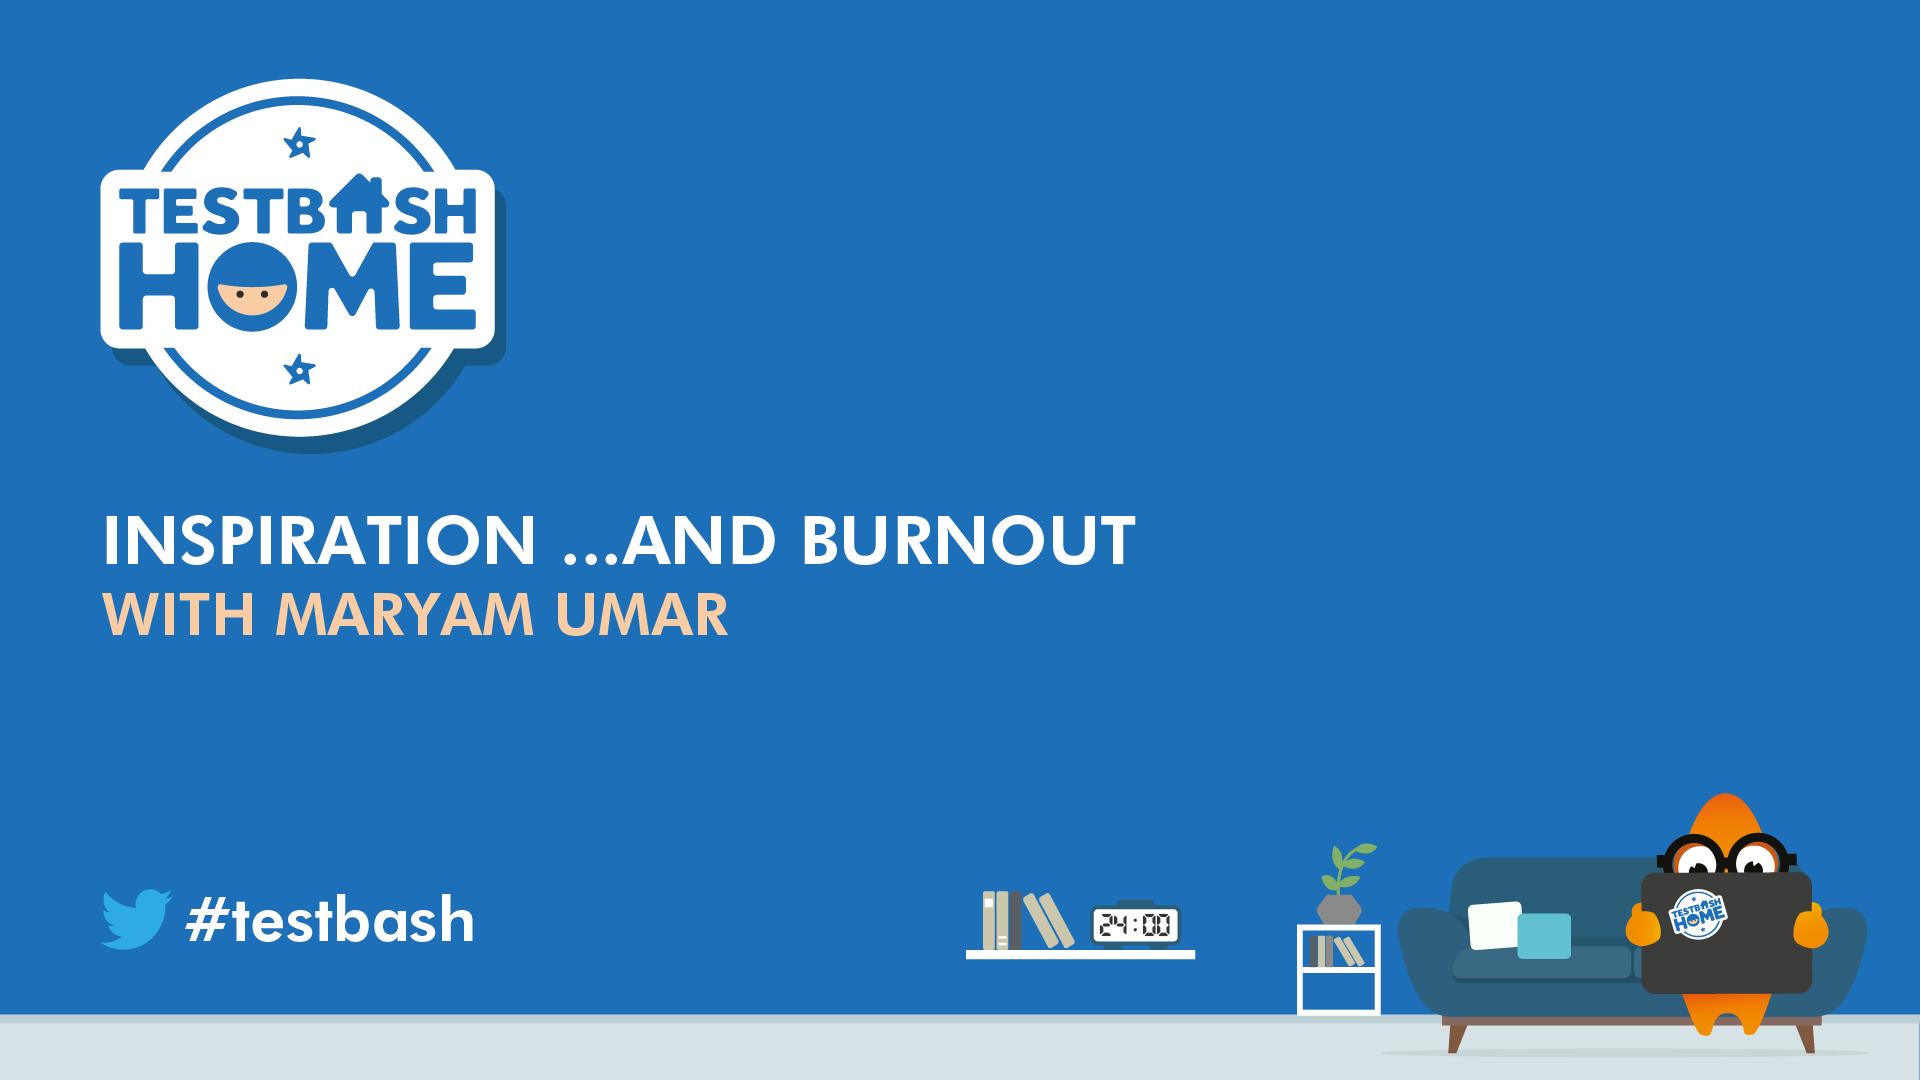 Inspiration ...and Burnout - Maryam Umar